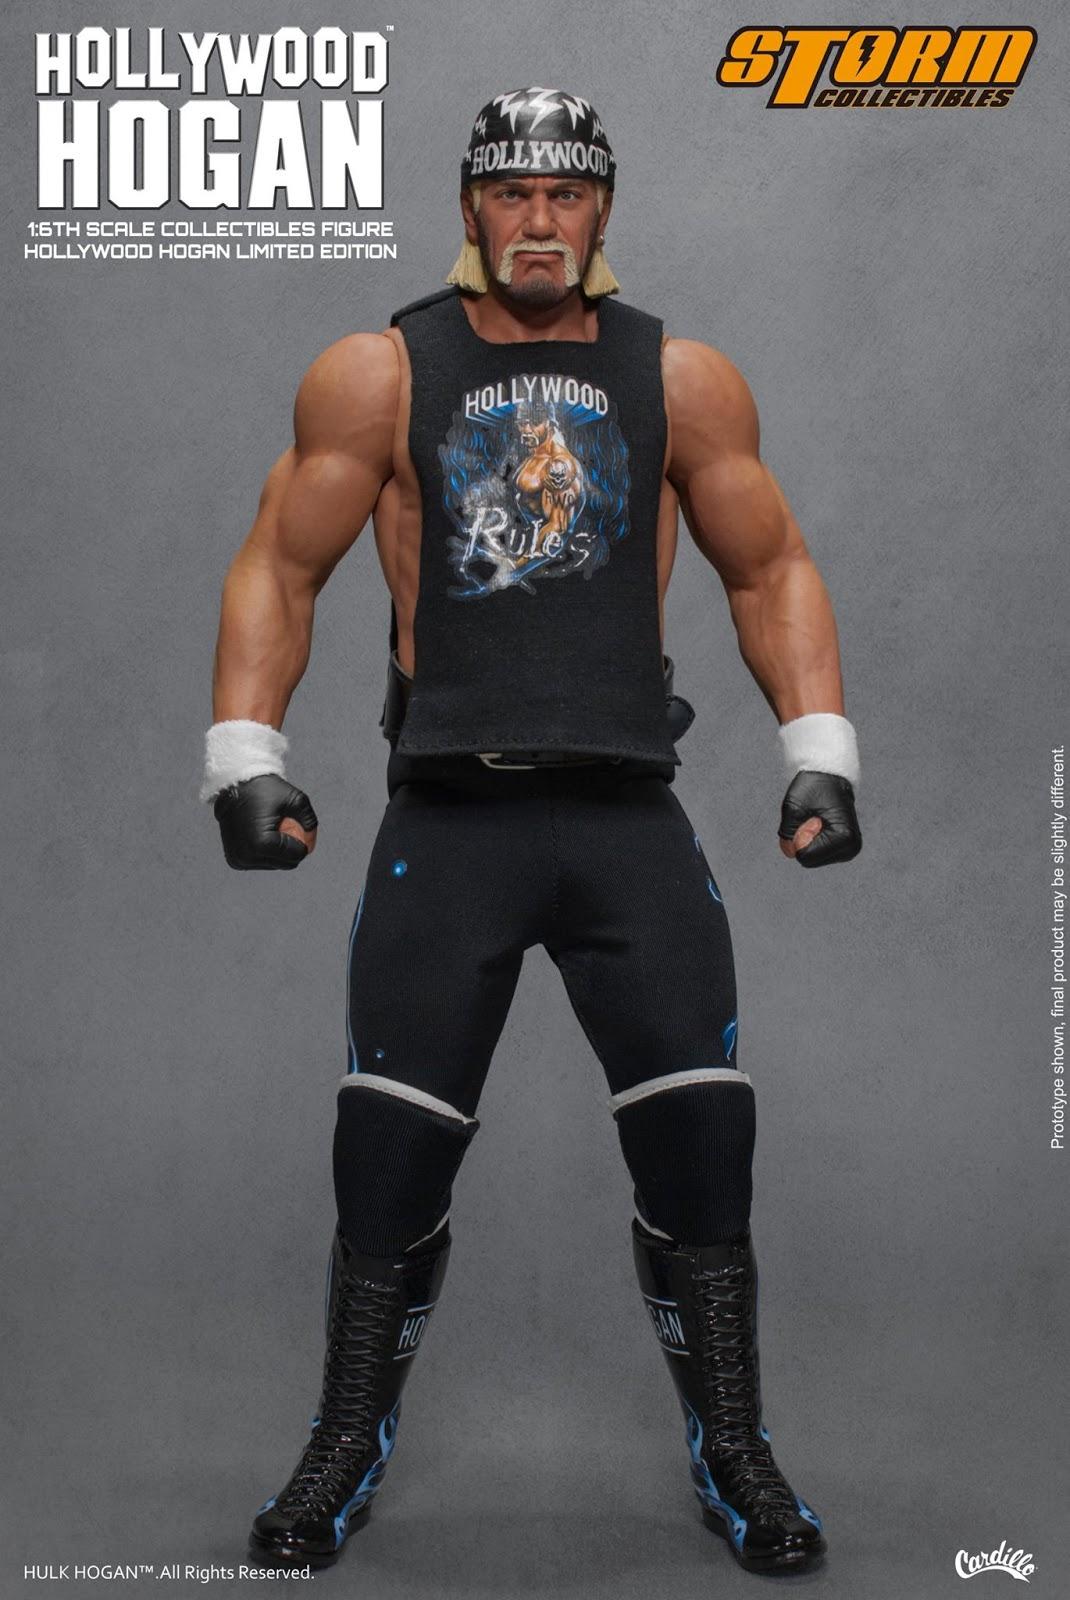 Hulk hogan recent-2167